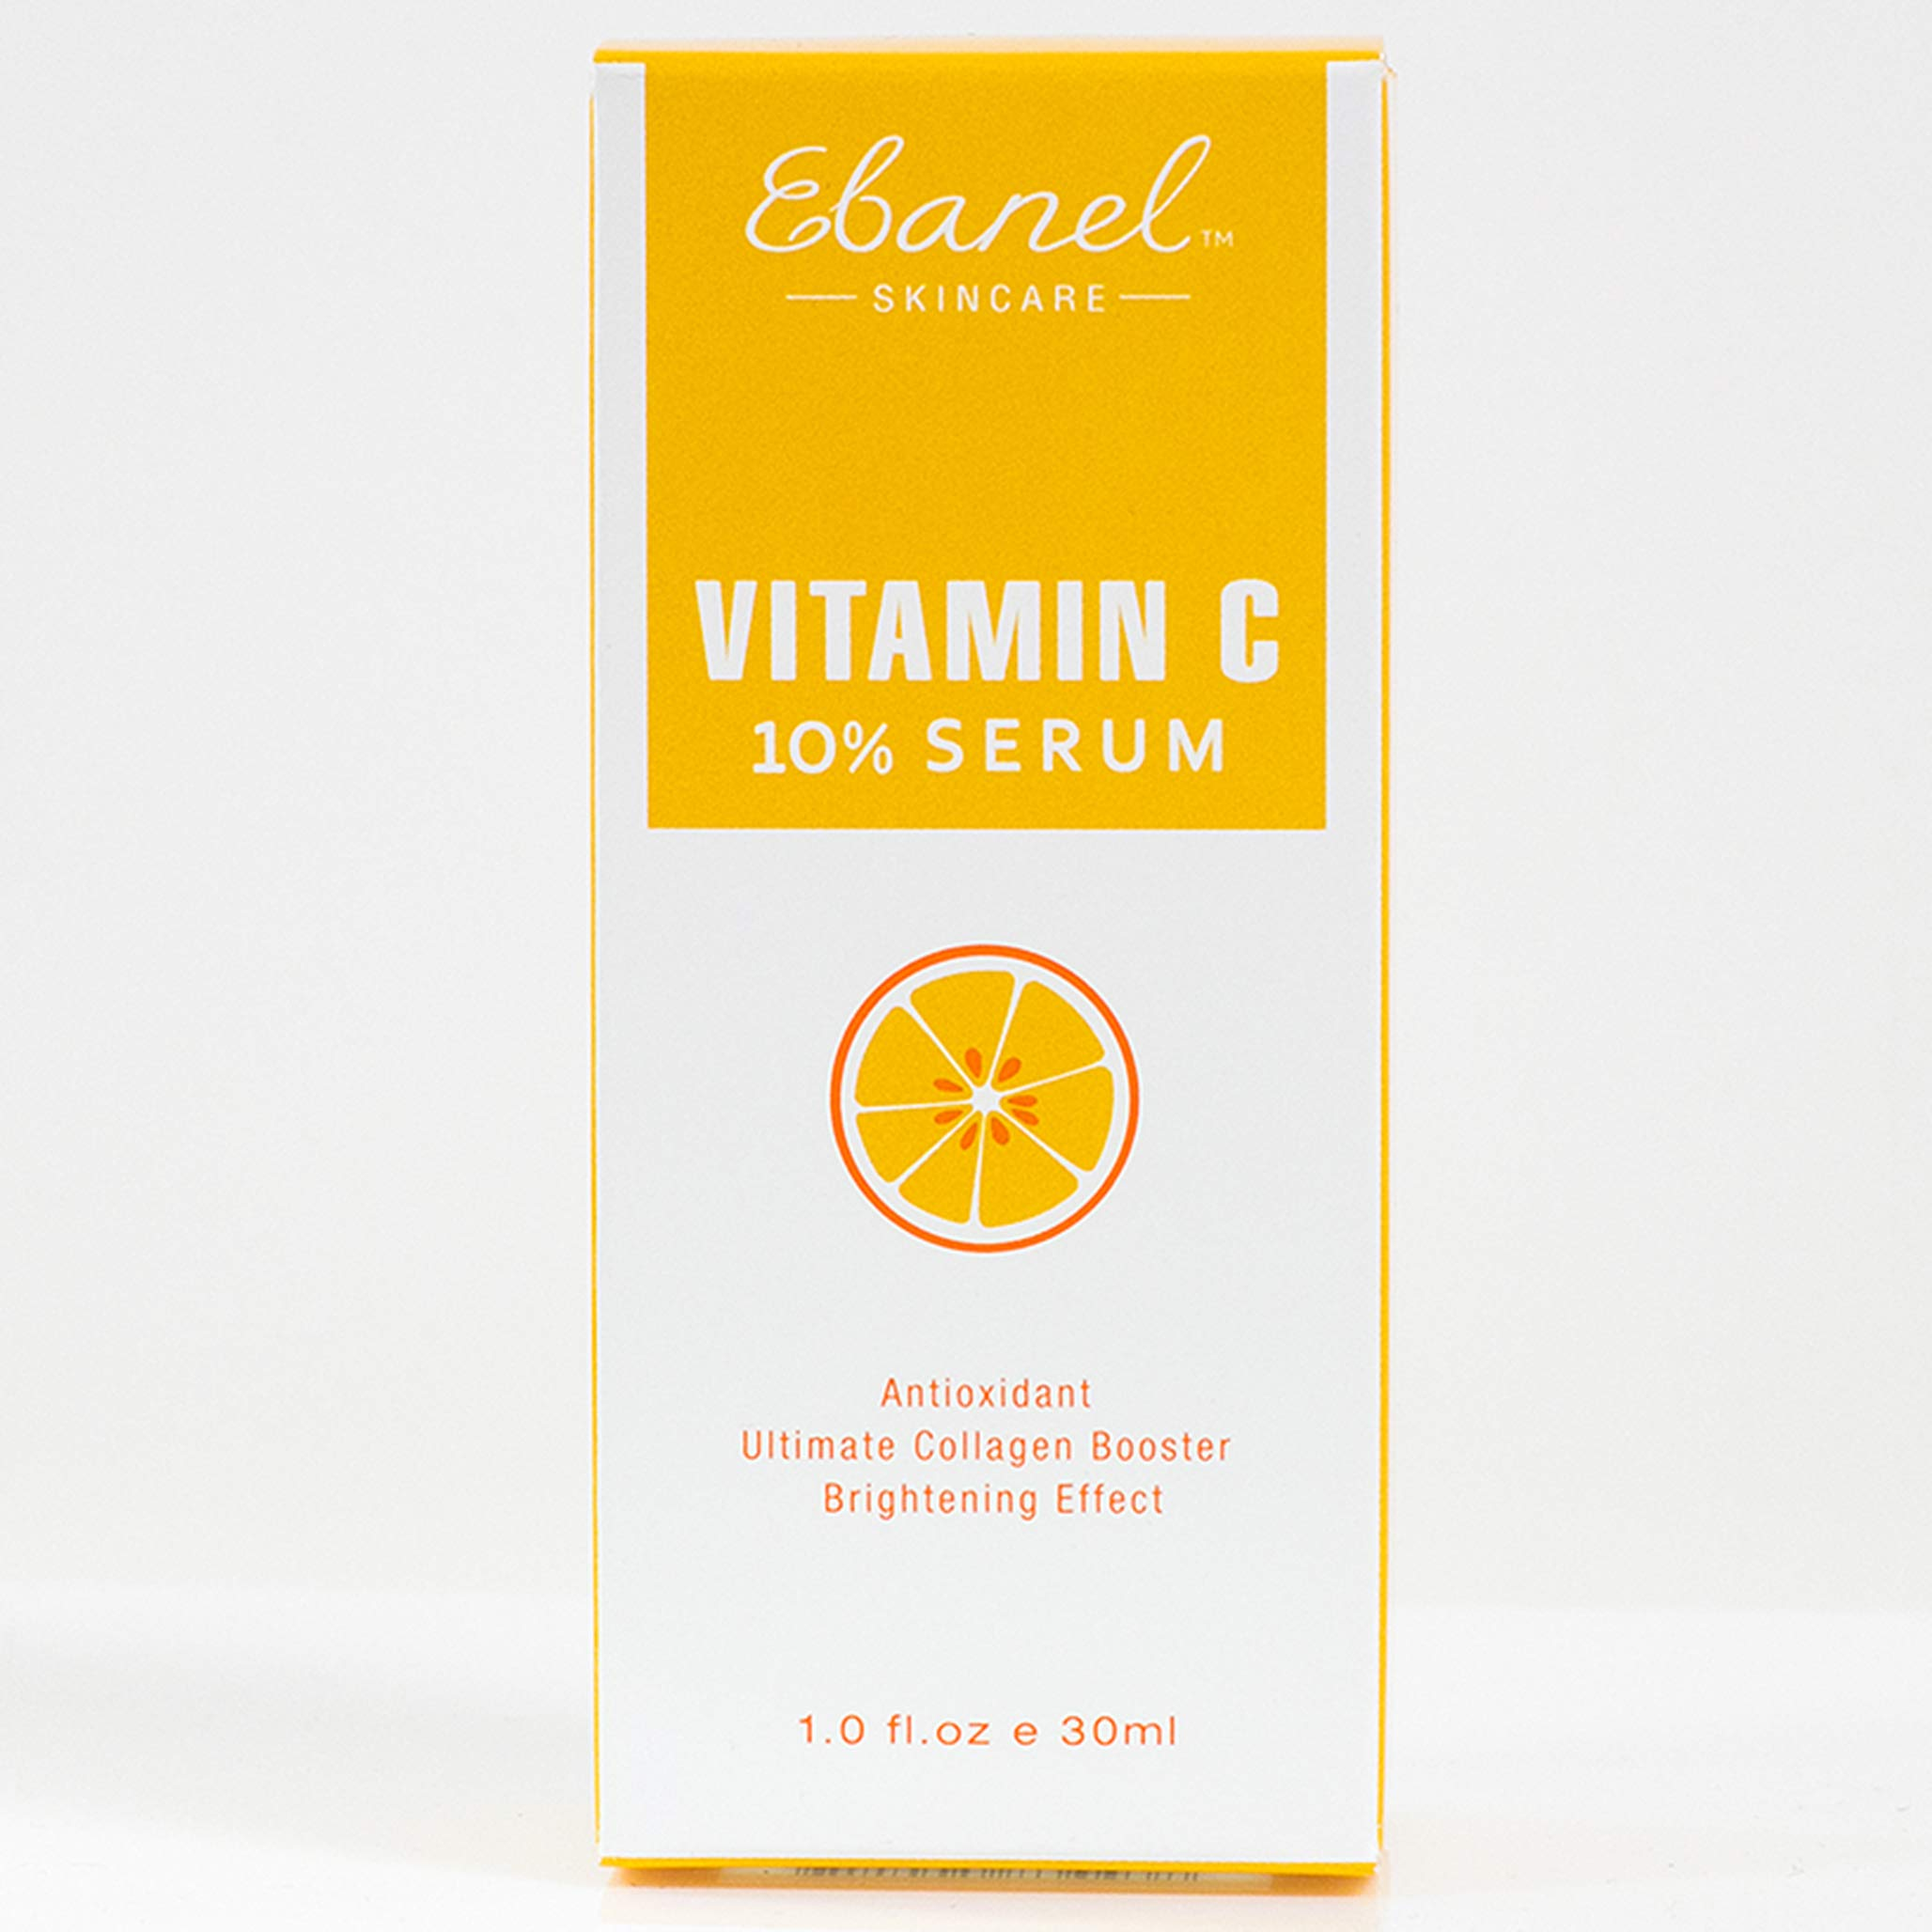 Ebanel Vitamin C 10% Serum (1 Oz / 30ml) Antioxidant, Ultimate Collagen Booster, Brightening Effect